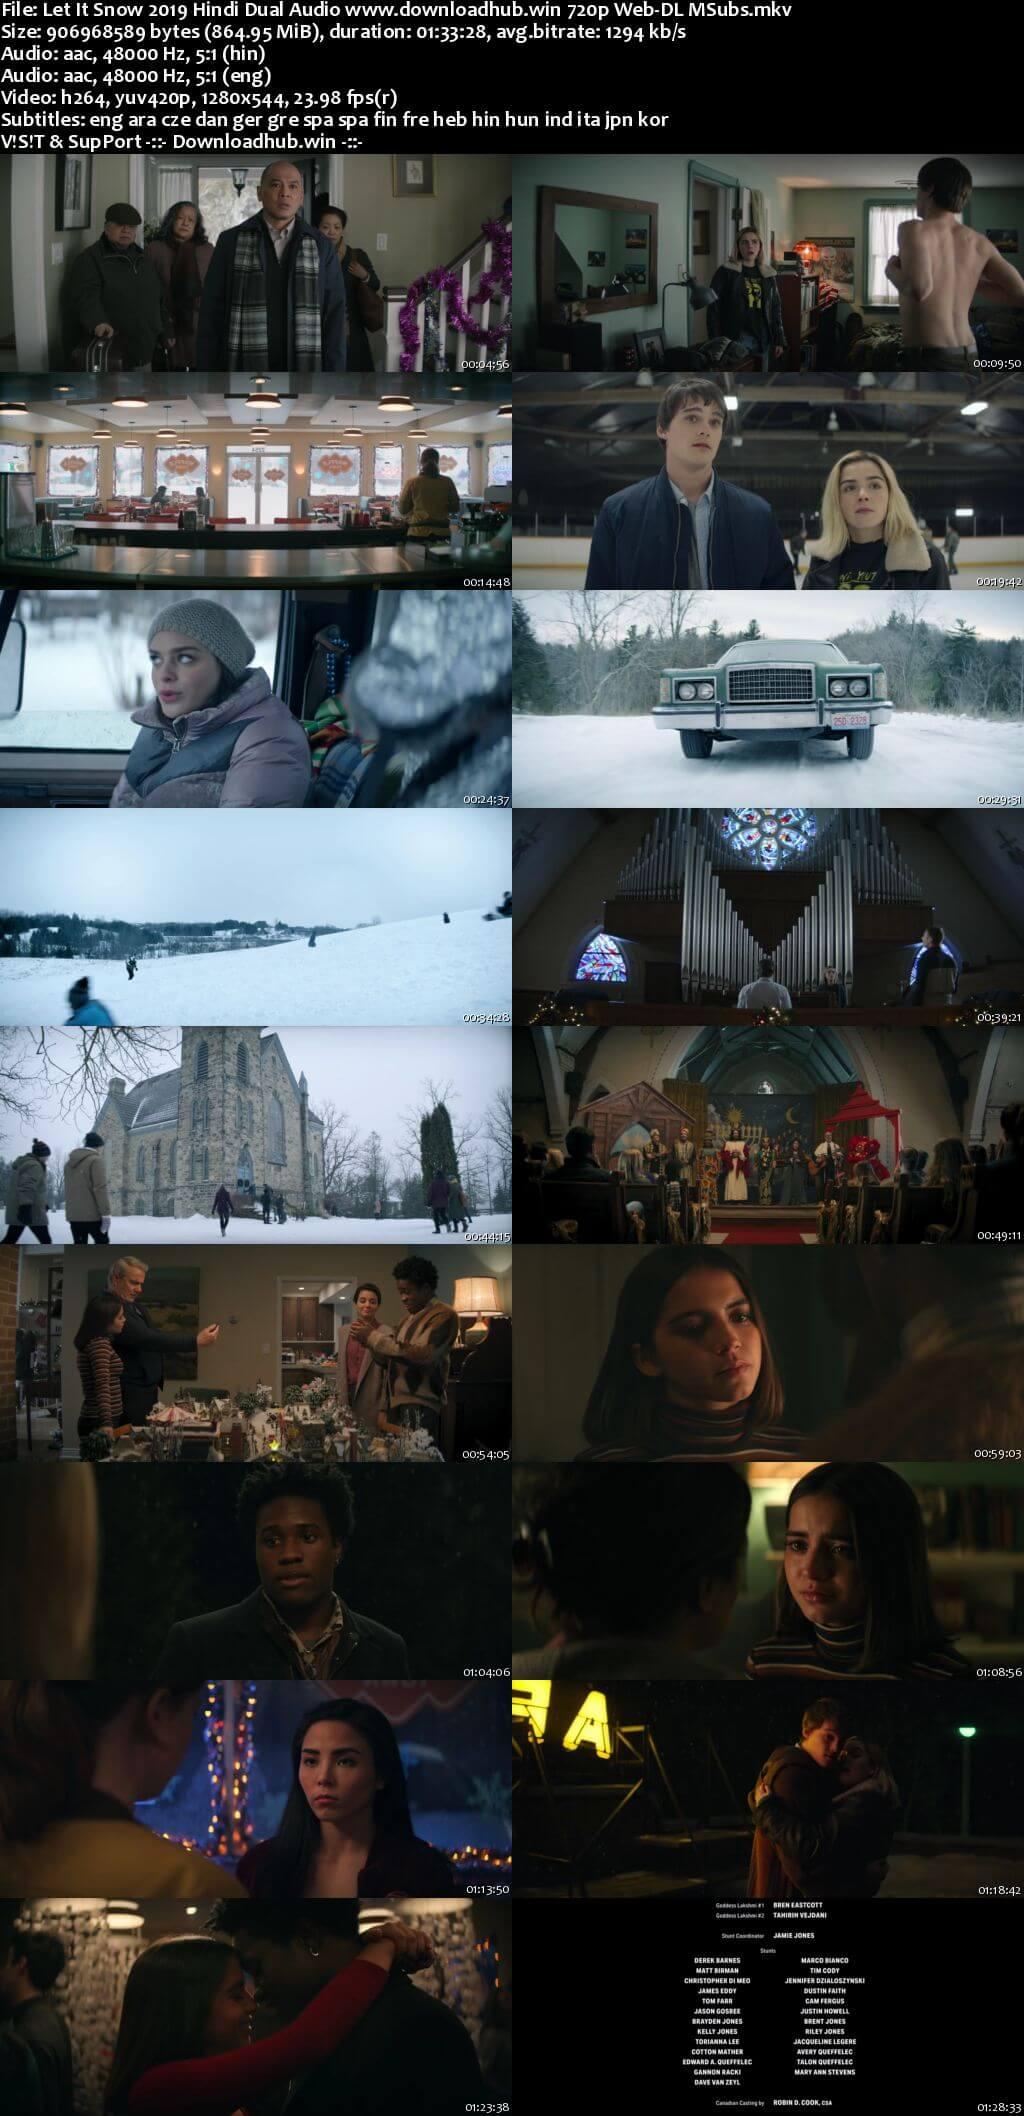 Let It Snow 2019 Hindi Dual Audio 720p Web-DL MSubs